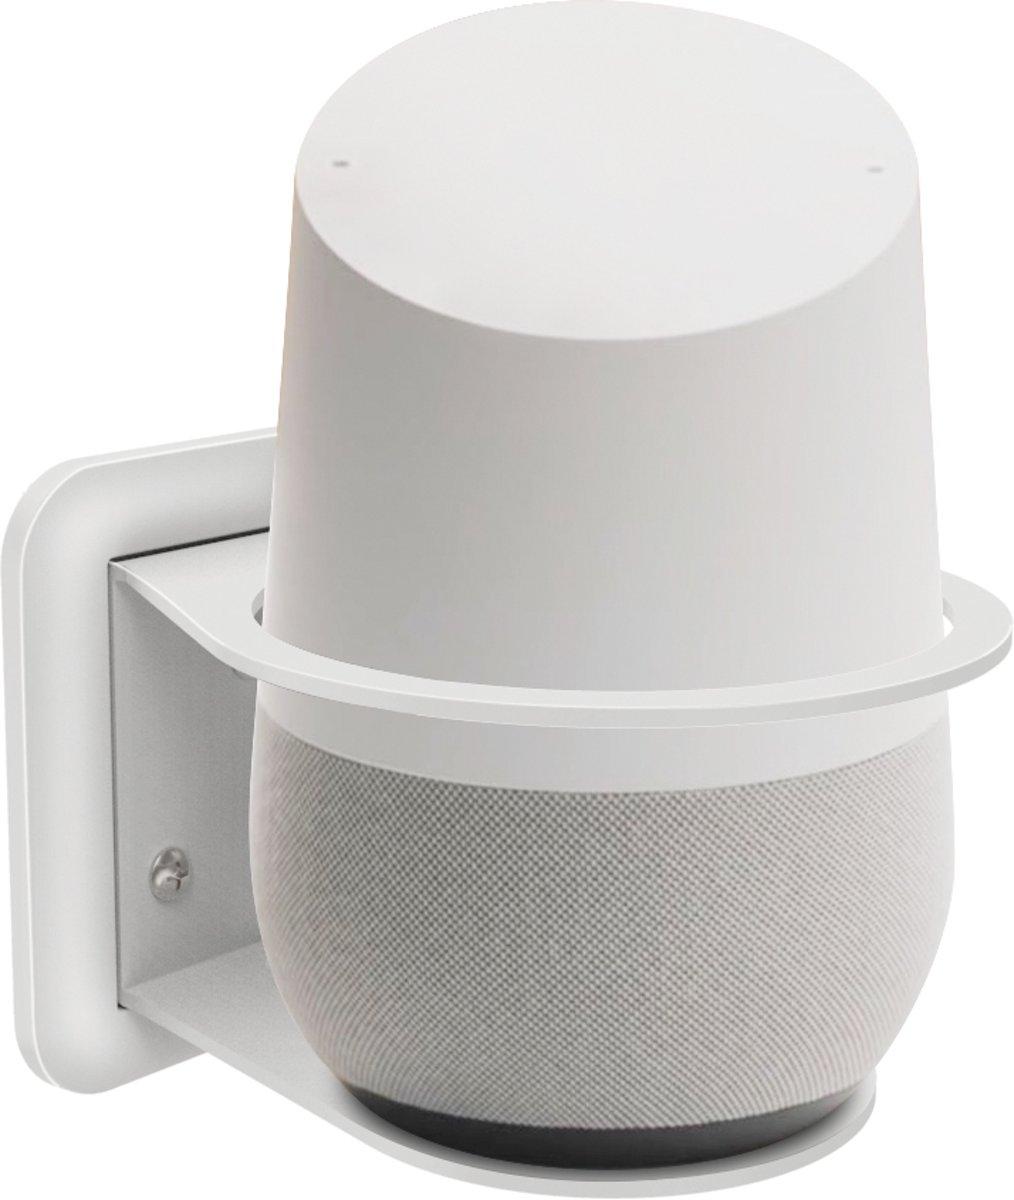 Wand Houder Case Mount Voor Google Nest Home / Amazon Echo 2 Plus Wifi Smart Speaker - Wit